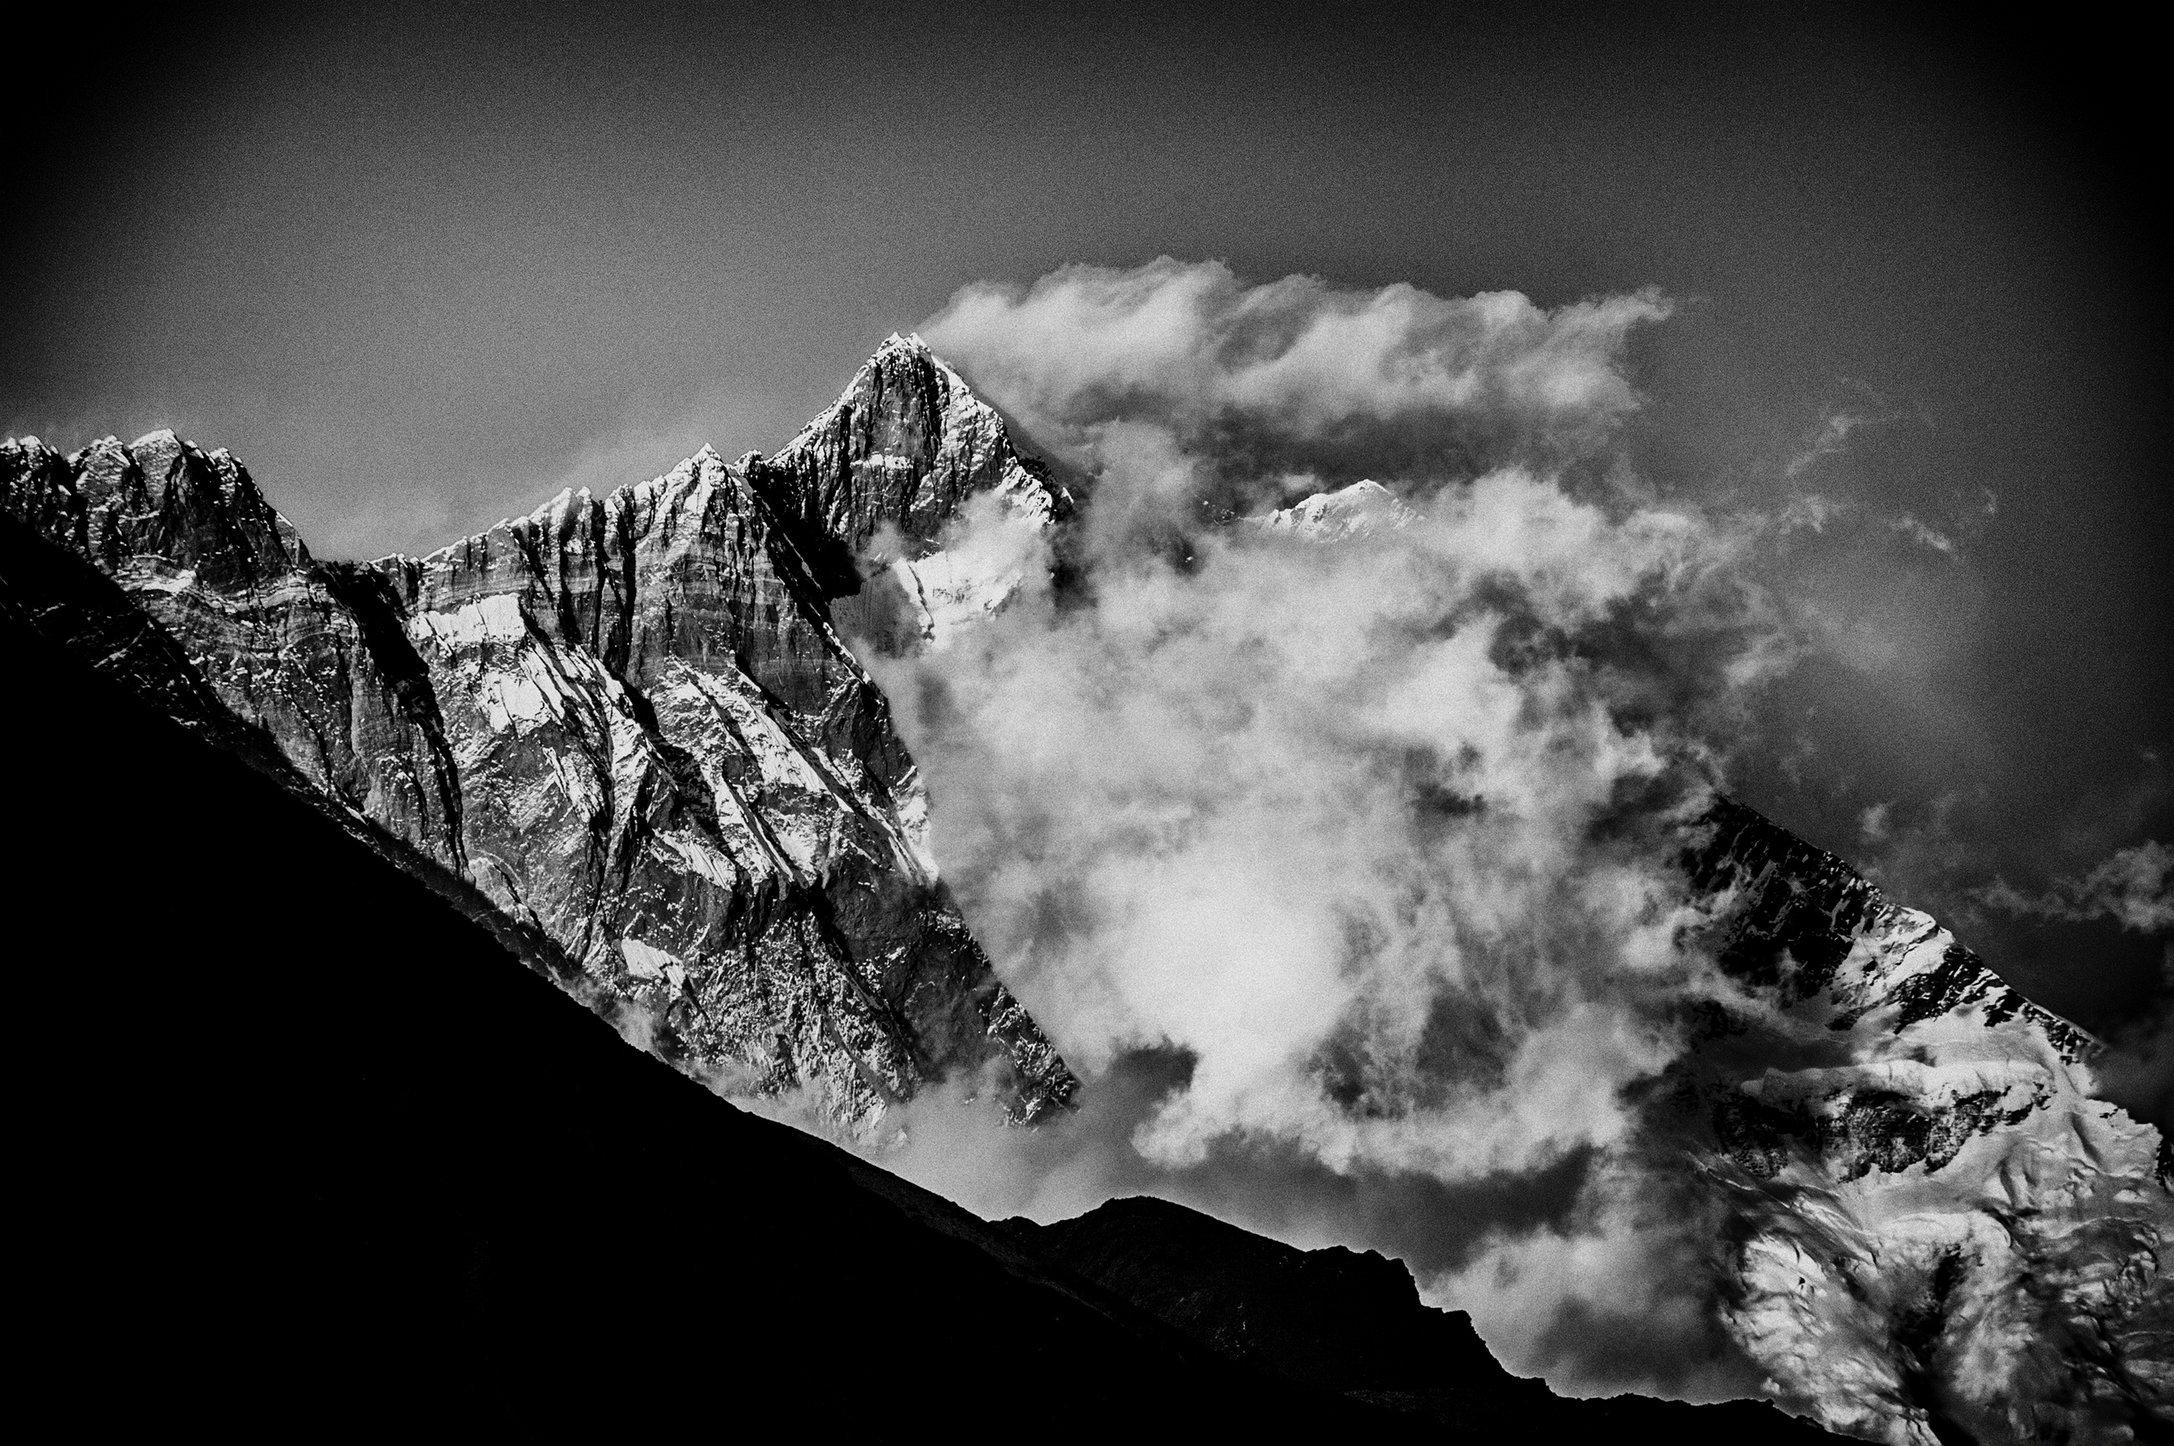 Lohtse, Himalaya-Nepal, 2011